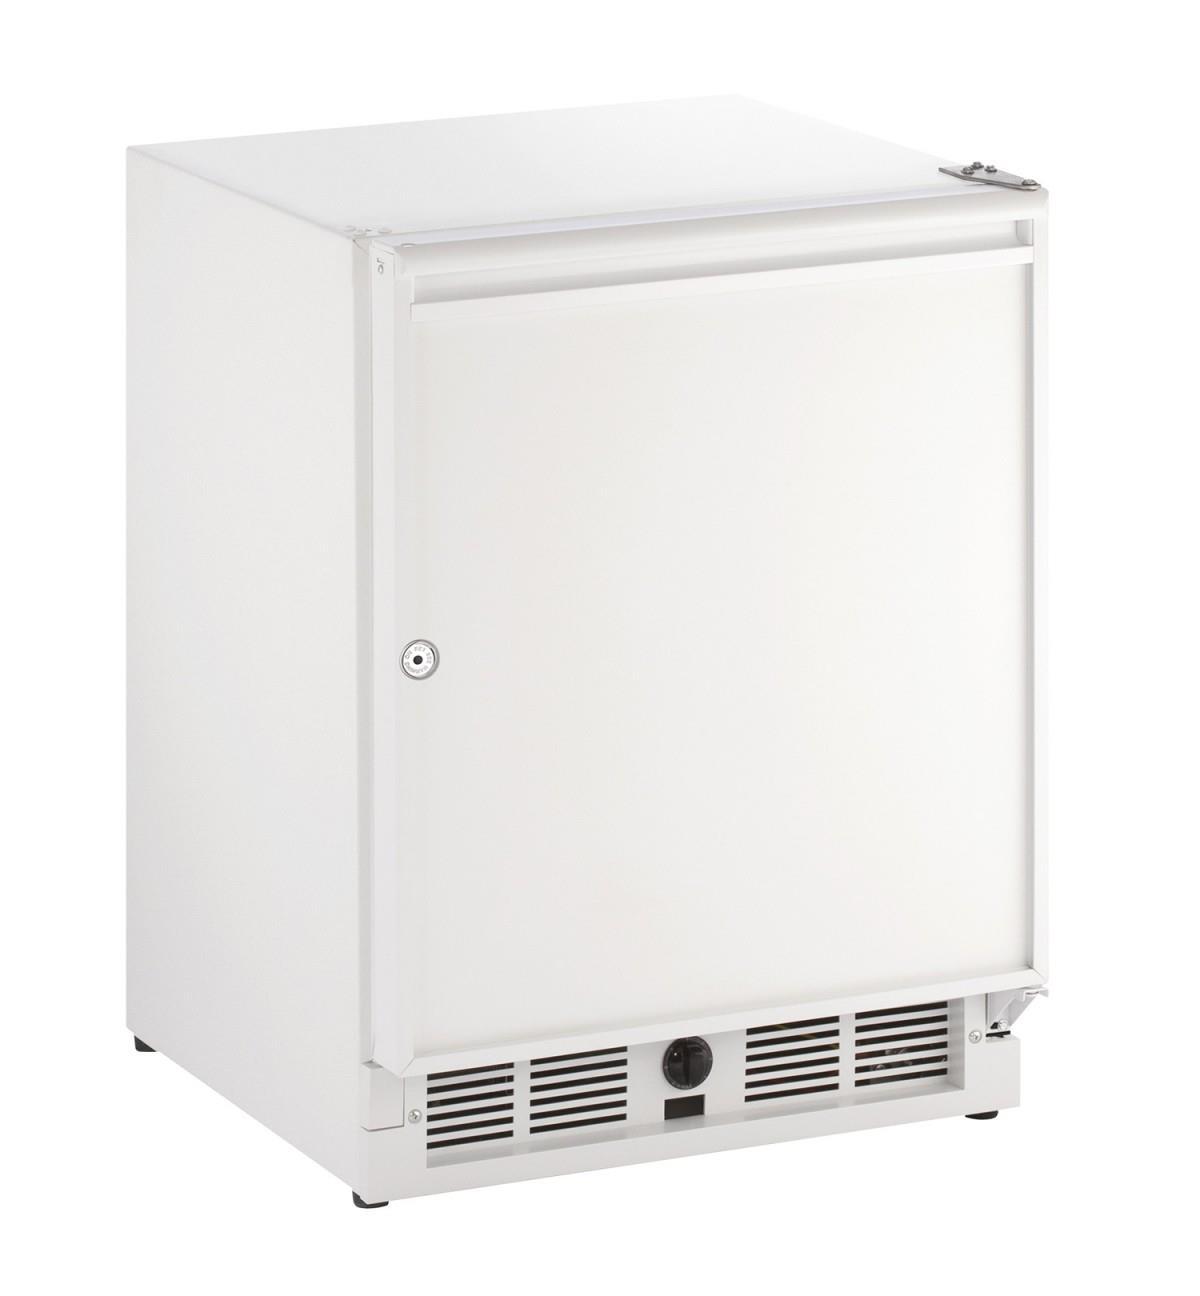 "U-Line Refrigerators 3.3 Cu. Ft. 18"" Compact All-Refrigerator - Item Number: U-29RW-15A"